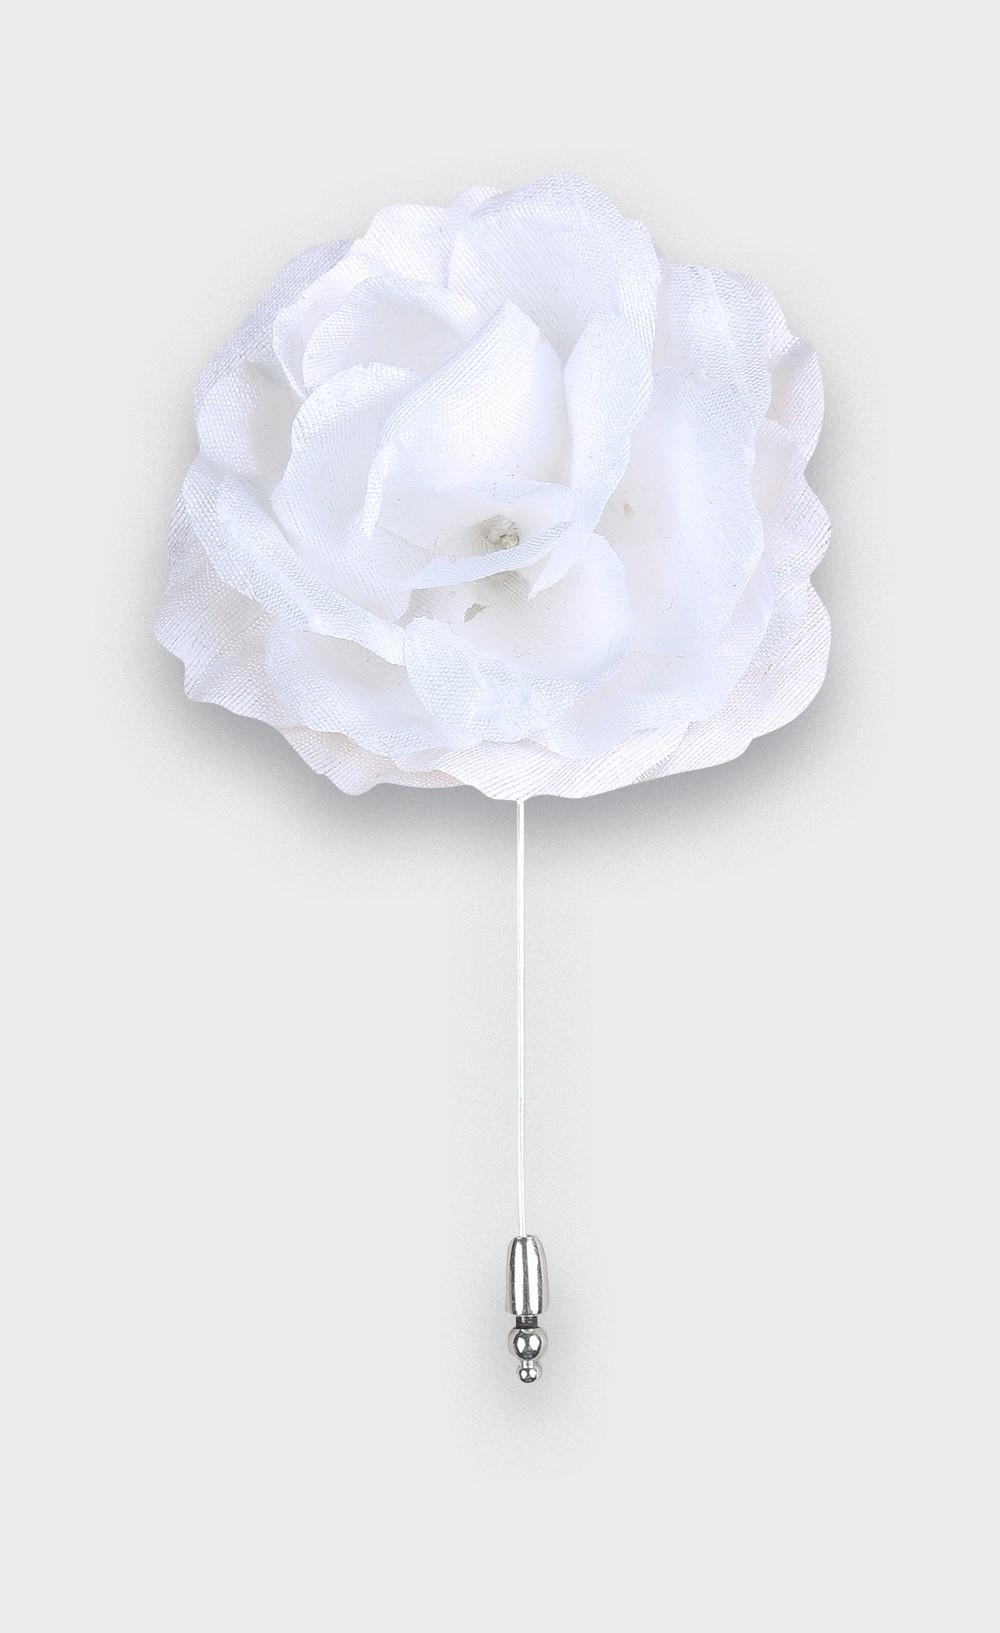 CINABRE Paris - Rose Lapel Pin - White Silk - Handmade